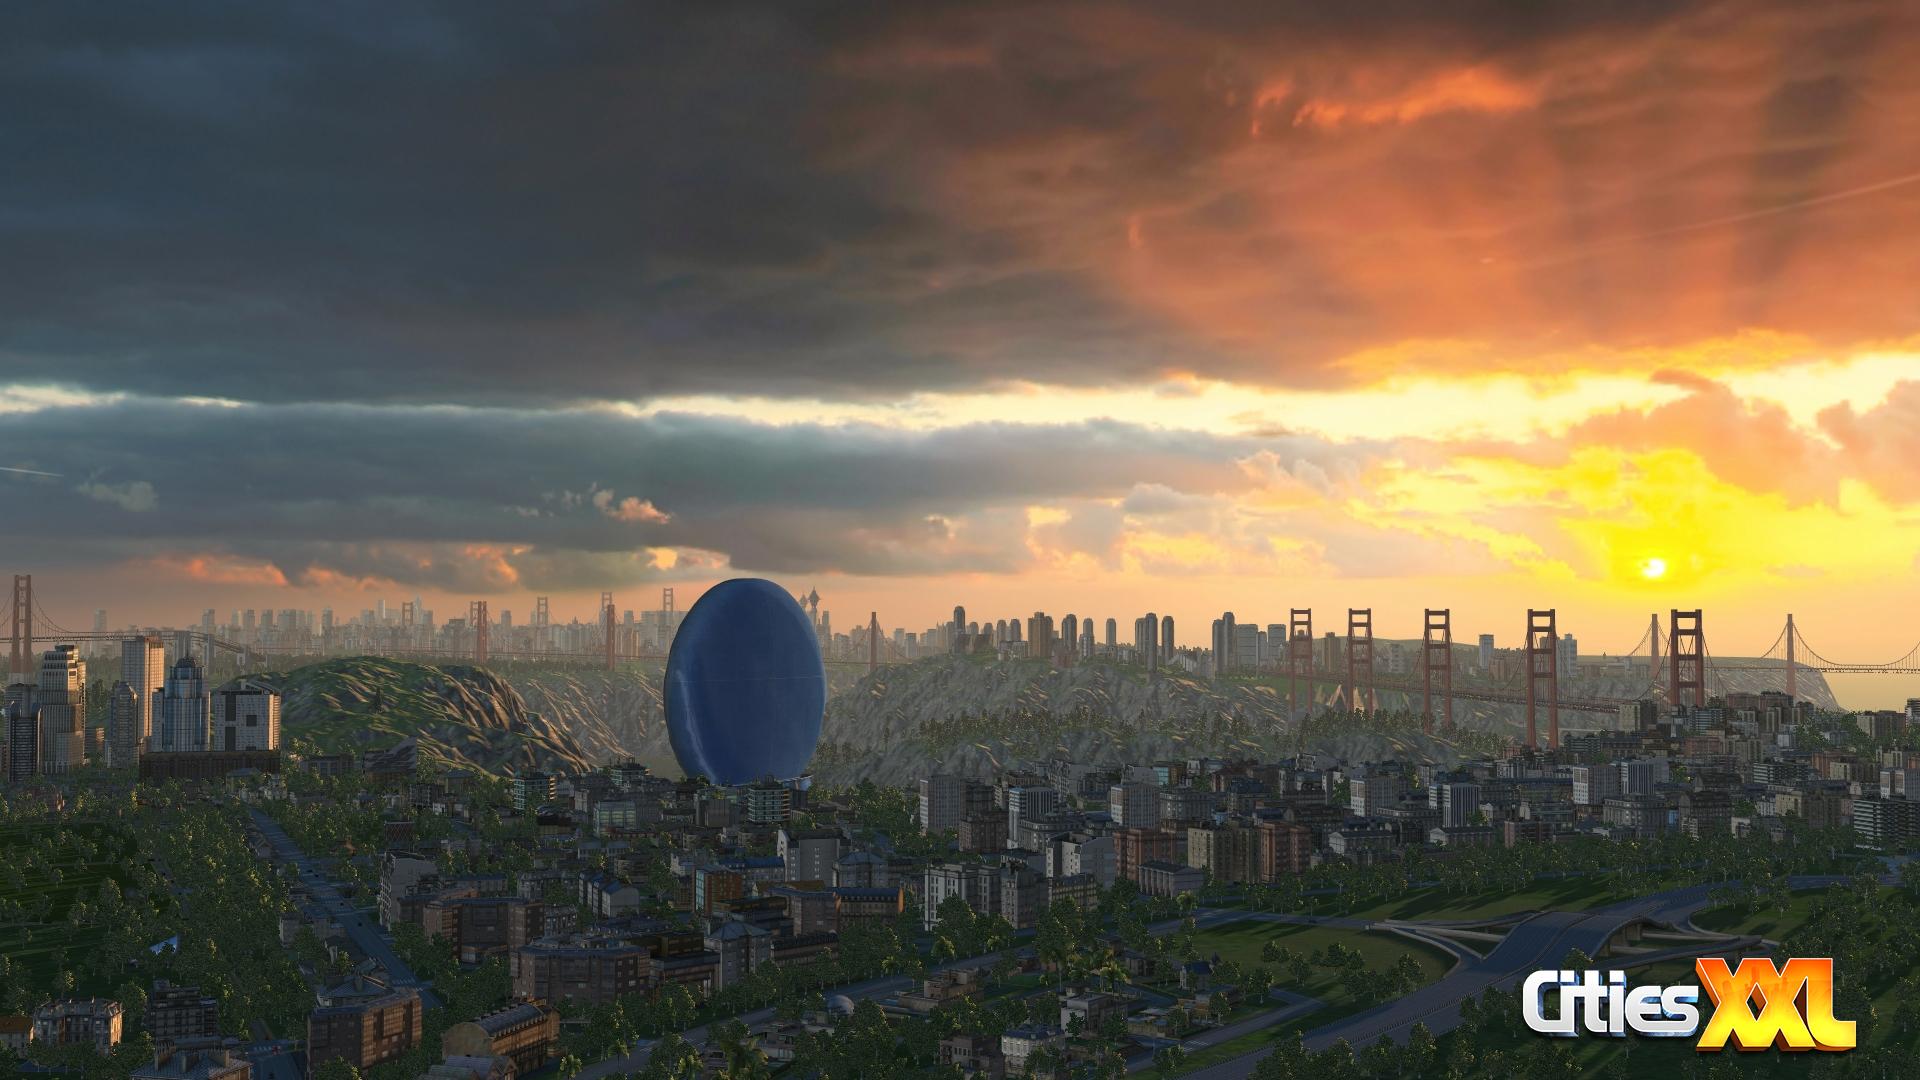 Cities XXL (1)